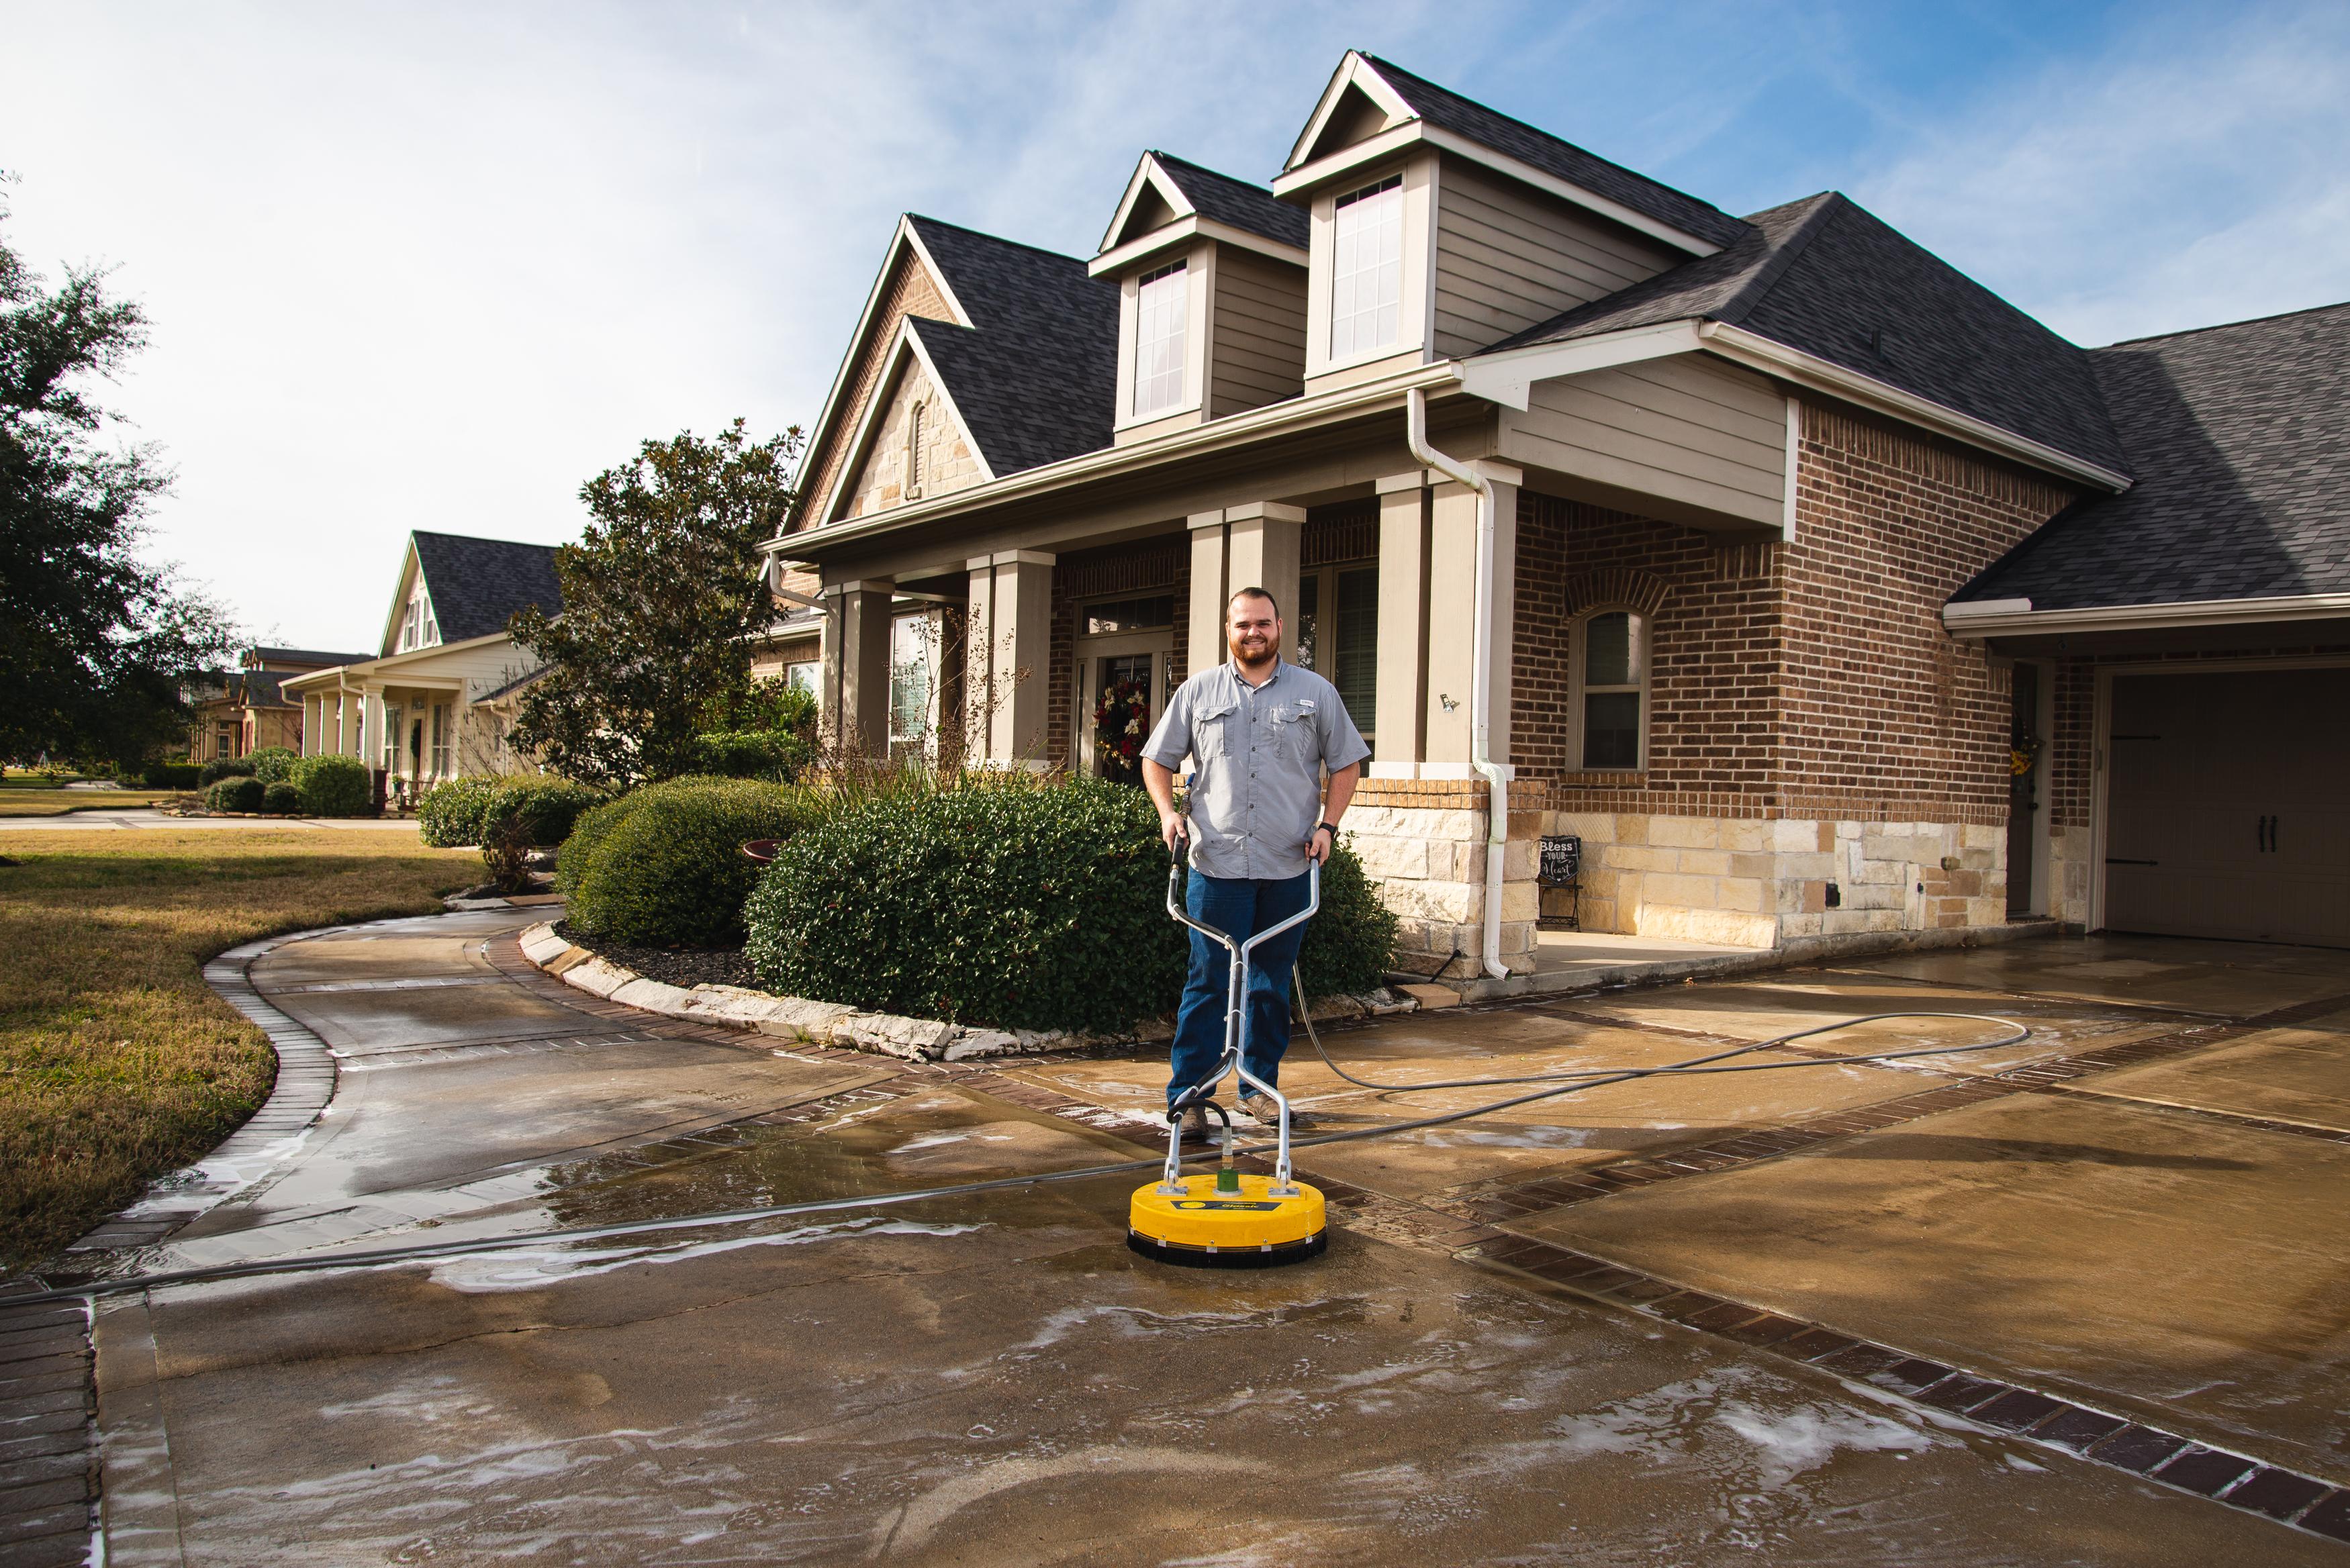 Katy Pressure Washing Service / #1 Power Washing - Fulshear, TX